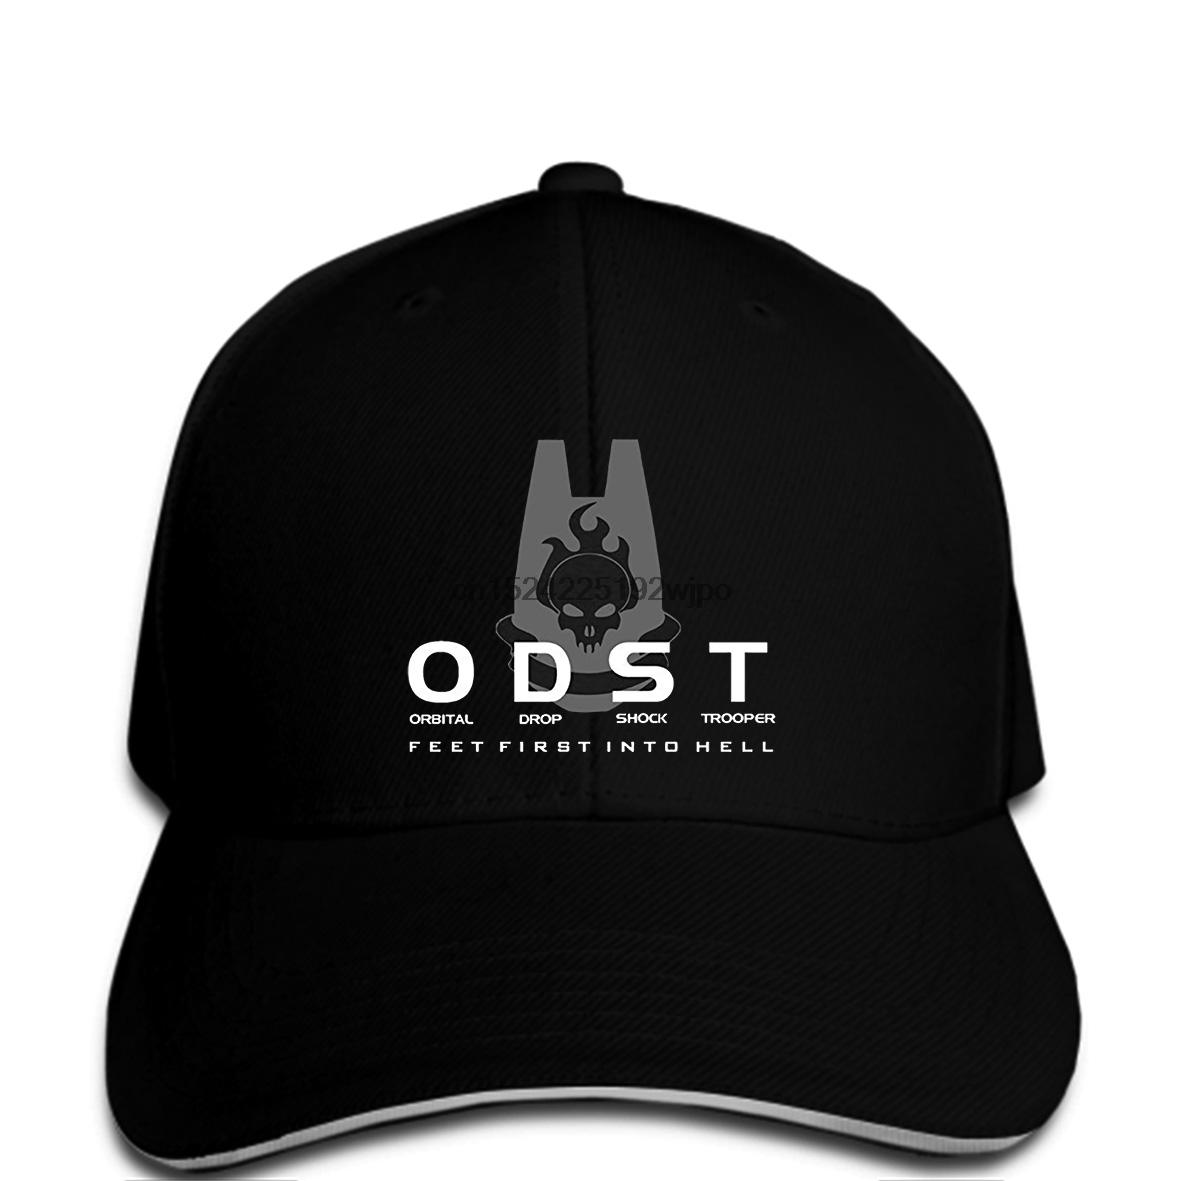 Men Baseball cap Funny Halo Odst Logo And Motto Black funny cap novelty cap women